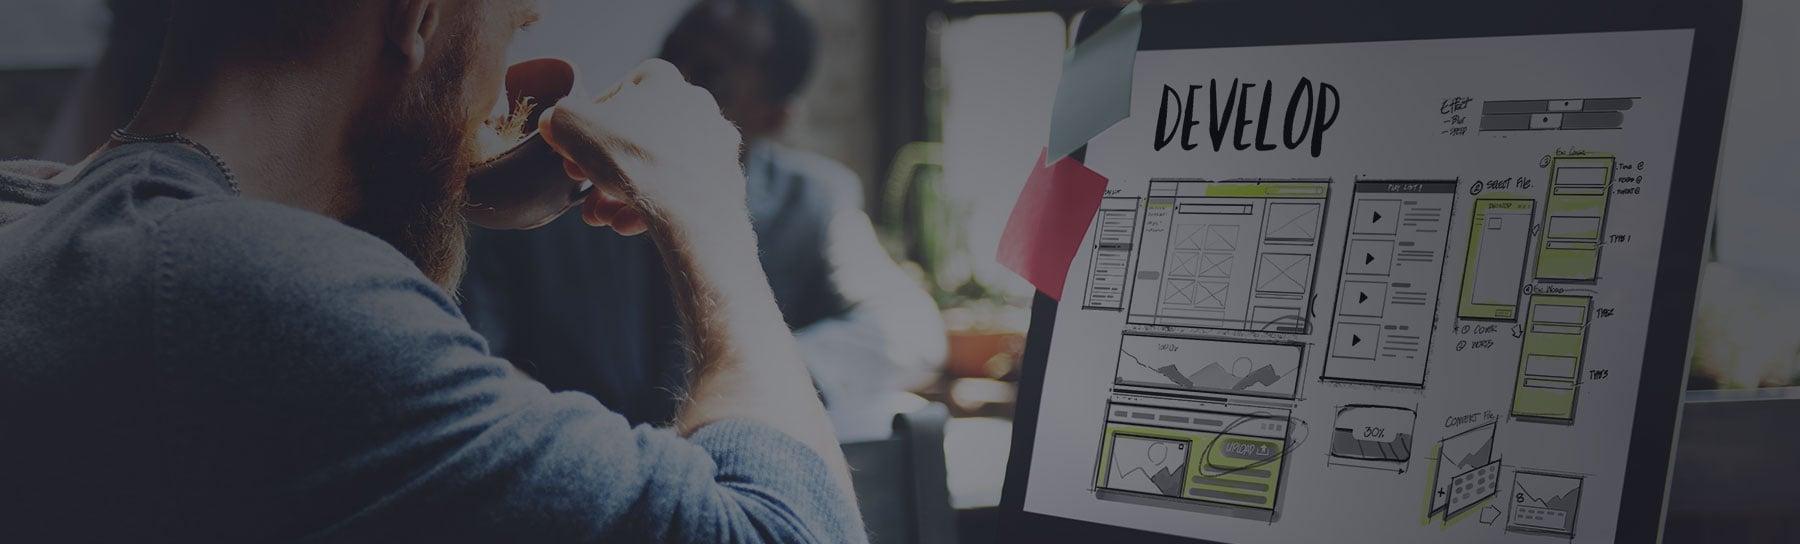 website-redesign-website-marketing.jpg